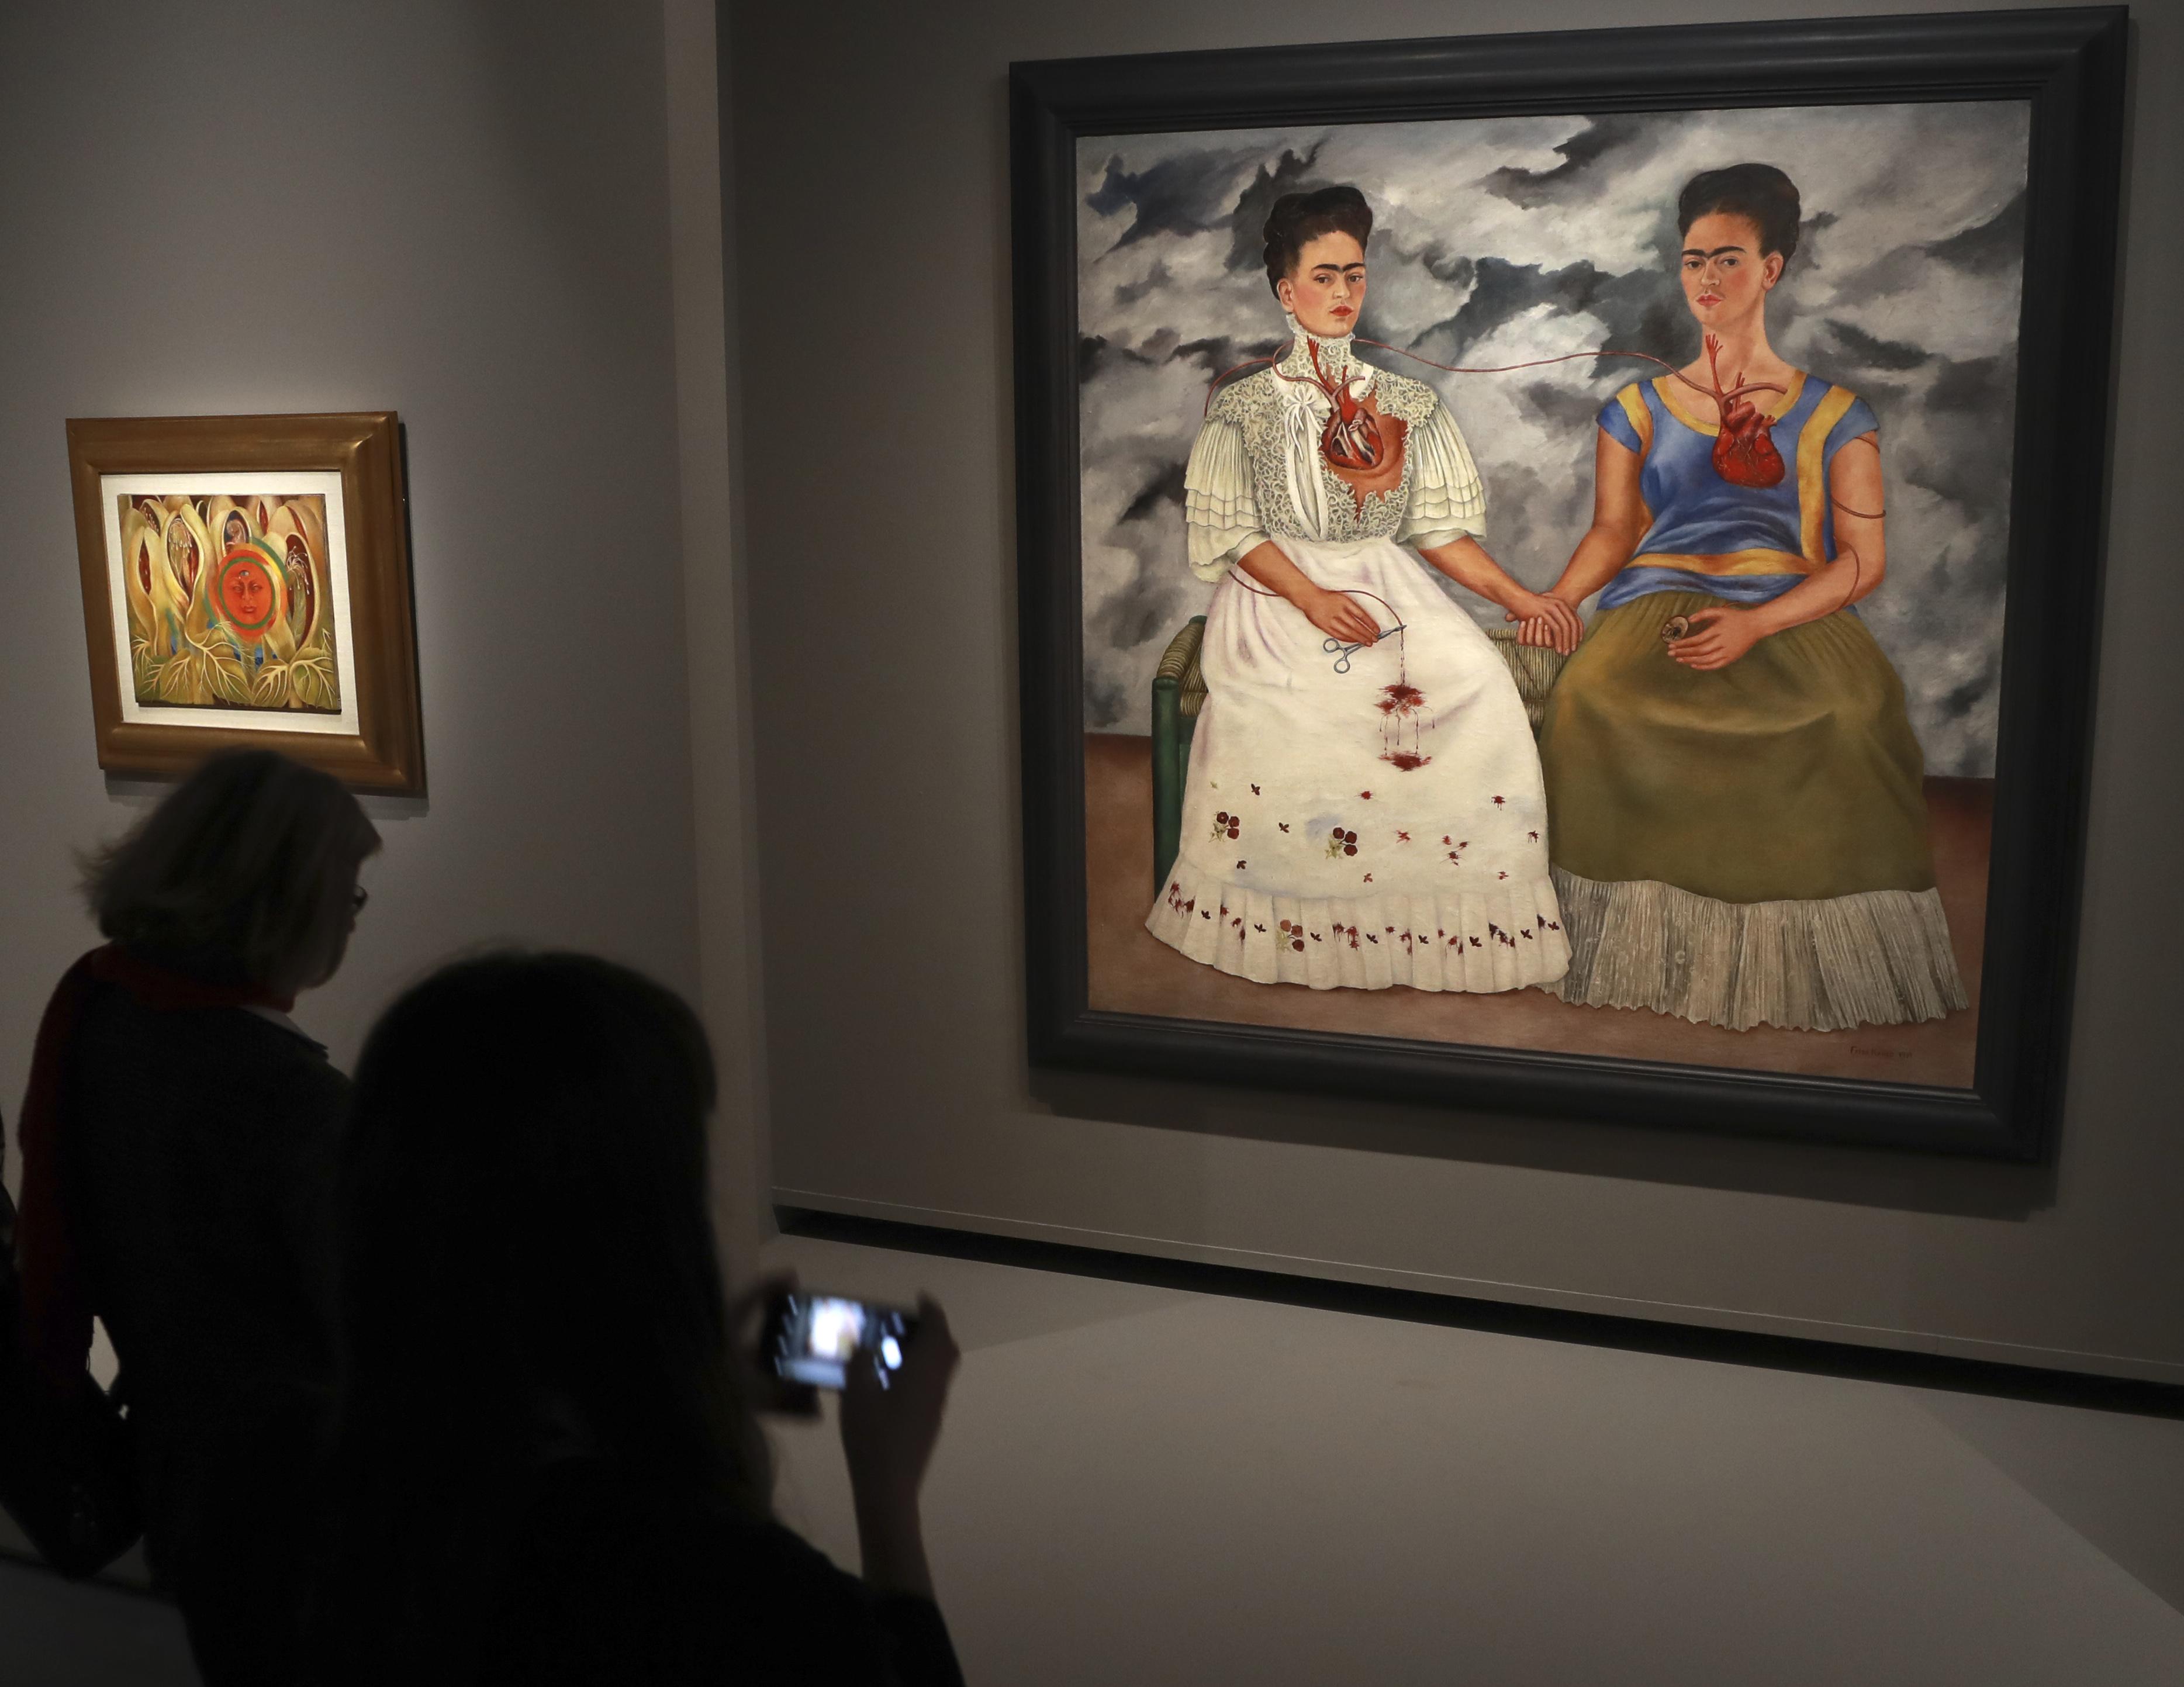 Chavela Vargas - La Llorona - Frida Kahlo (Diegoya mektup